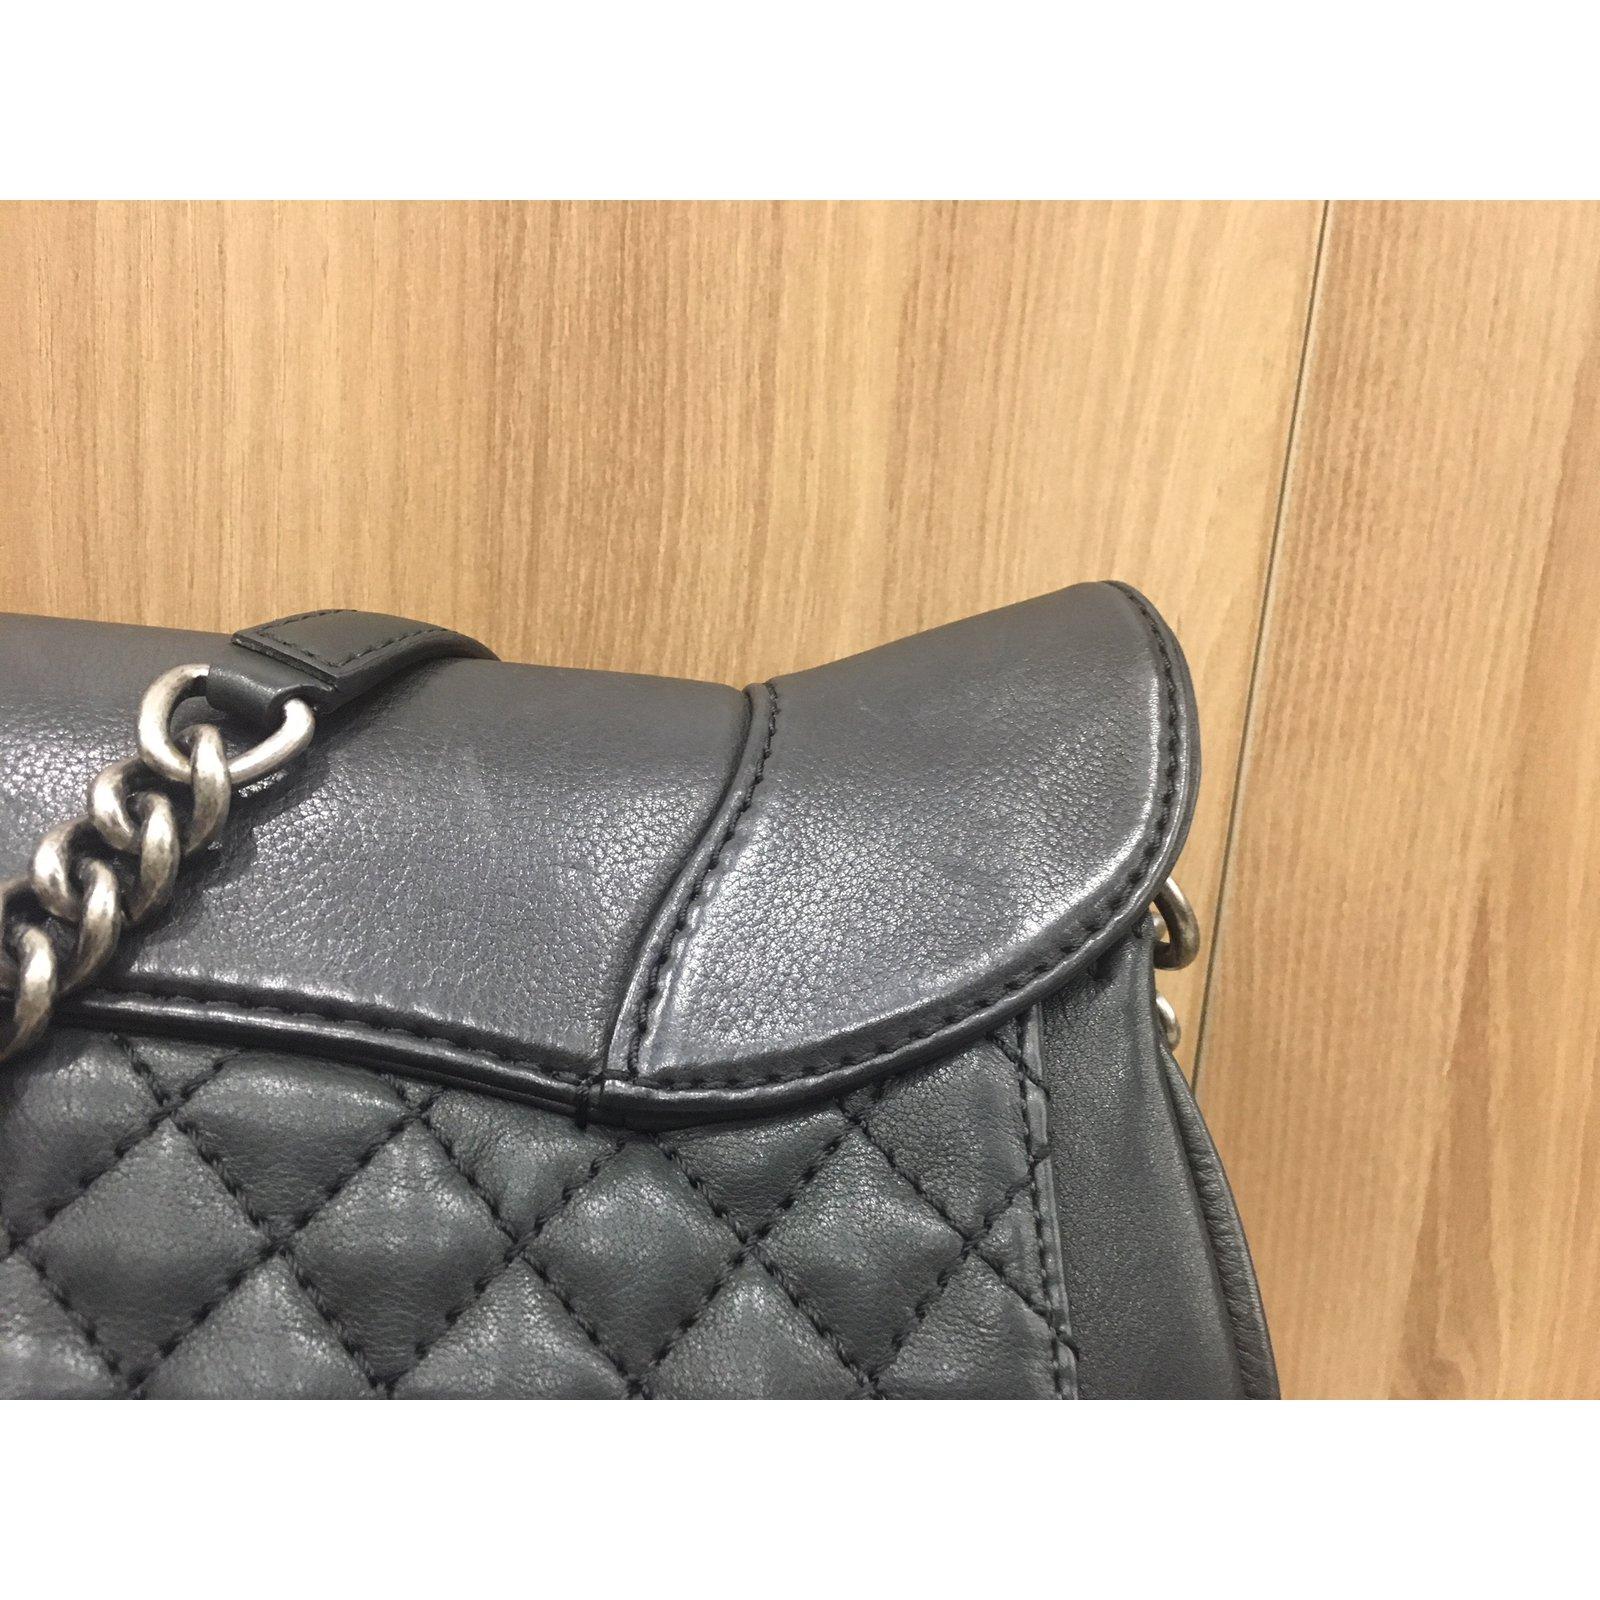 sacs main chanel large cowboy style chanel bag cuir noir joli closet. Black Bedroom Furniture Sets. Home Design Ideas